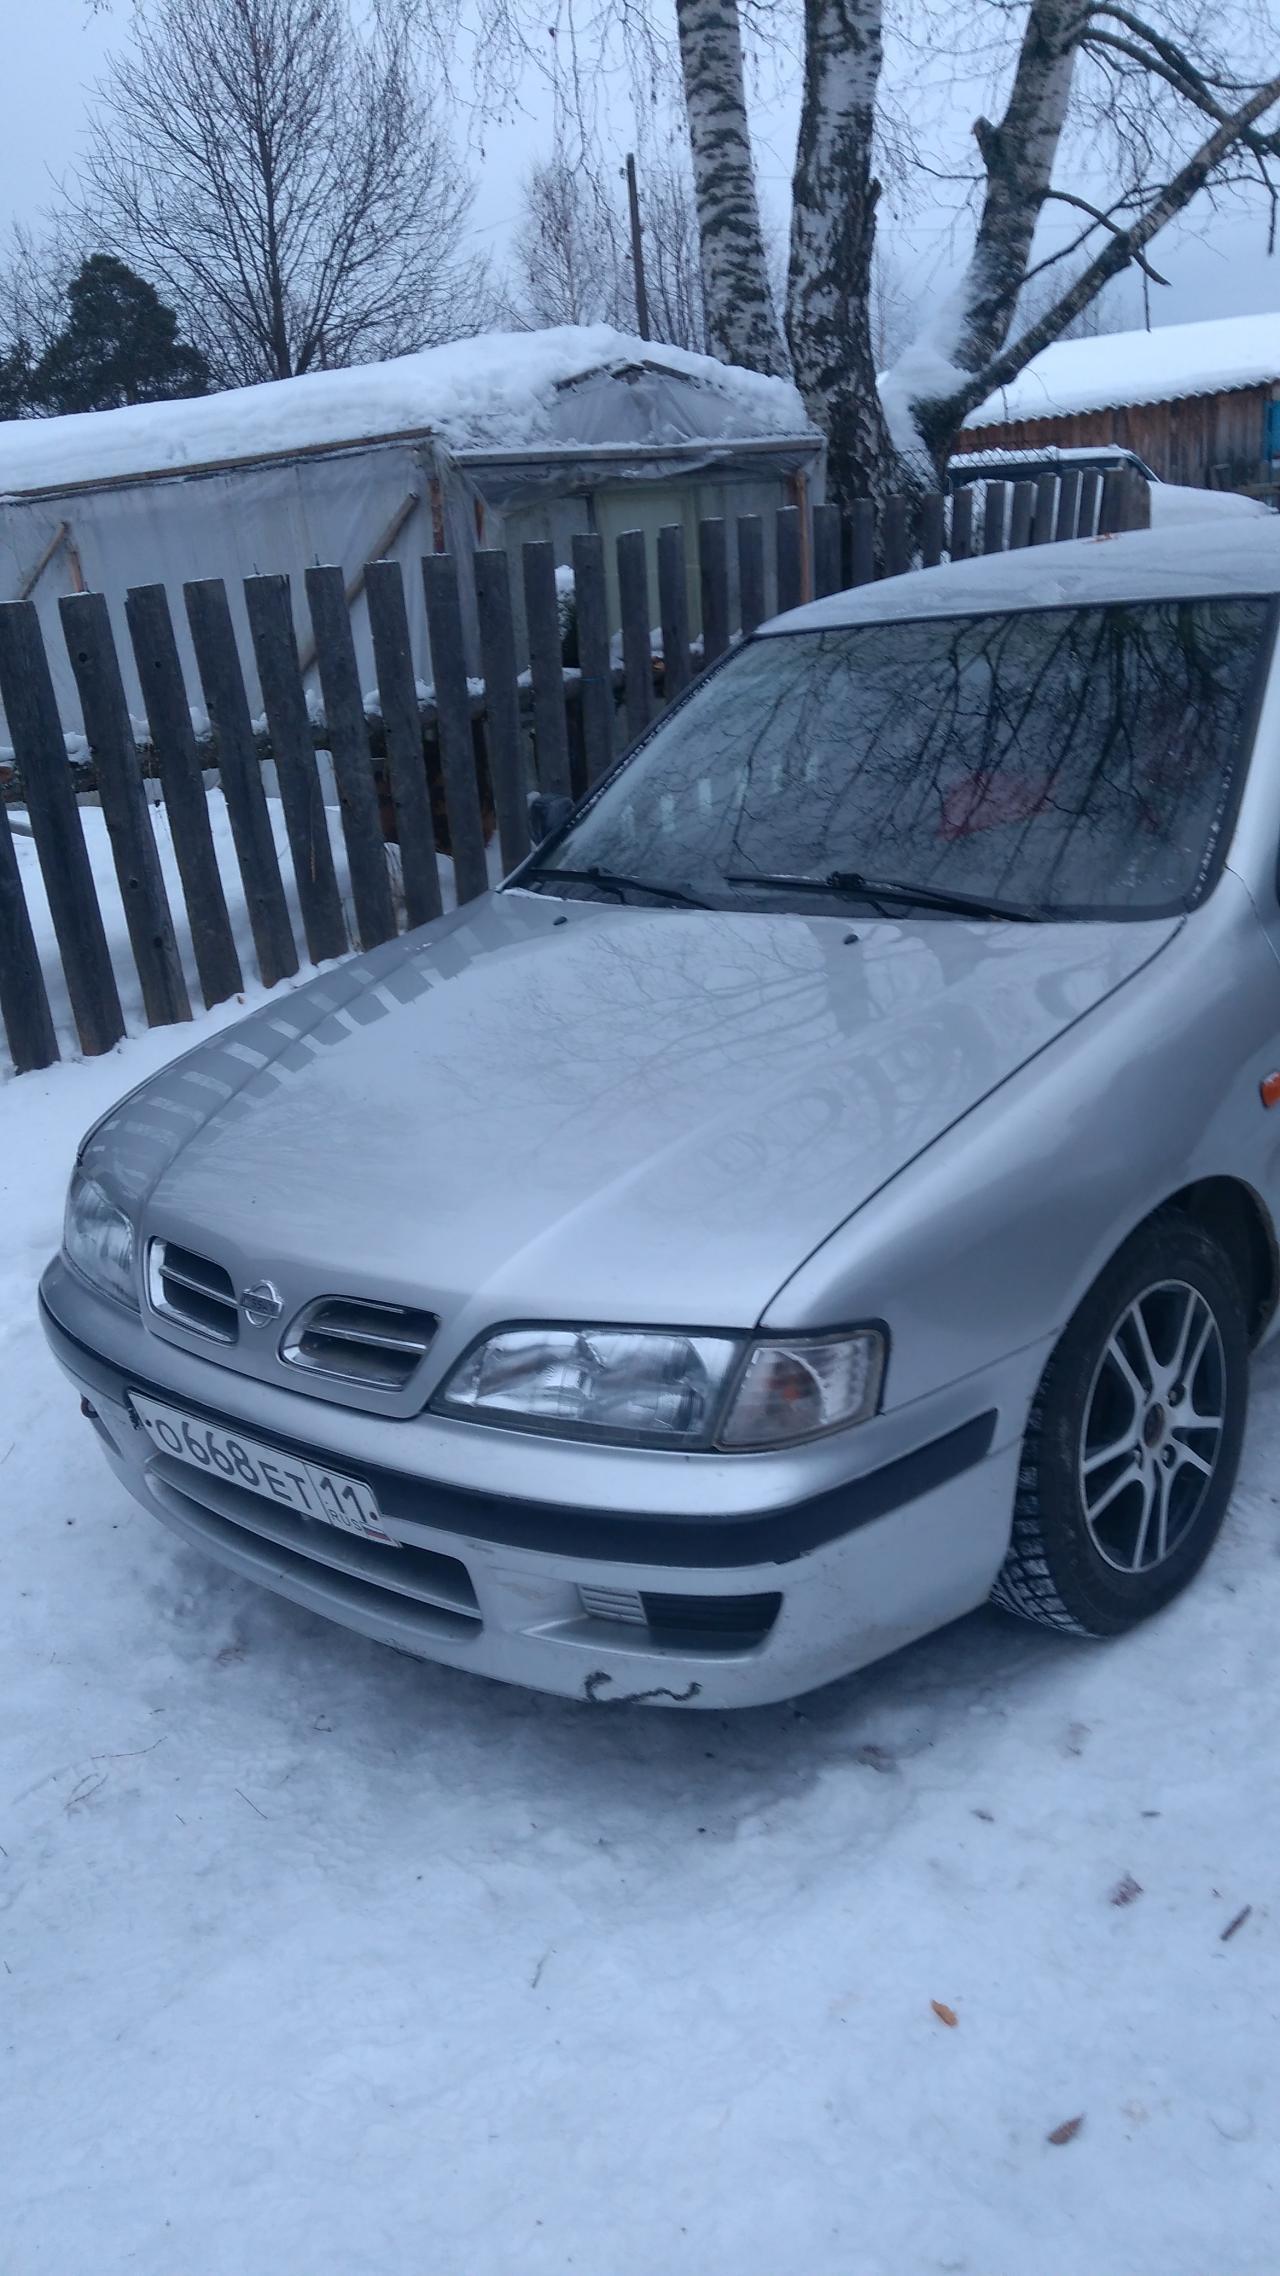 Nissan Primera 1997 г.в. г.Сыктывкар - фото 2